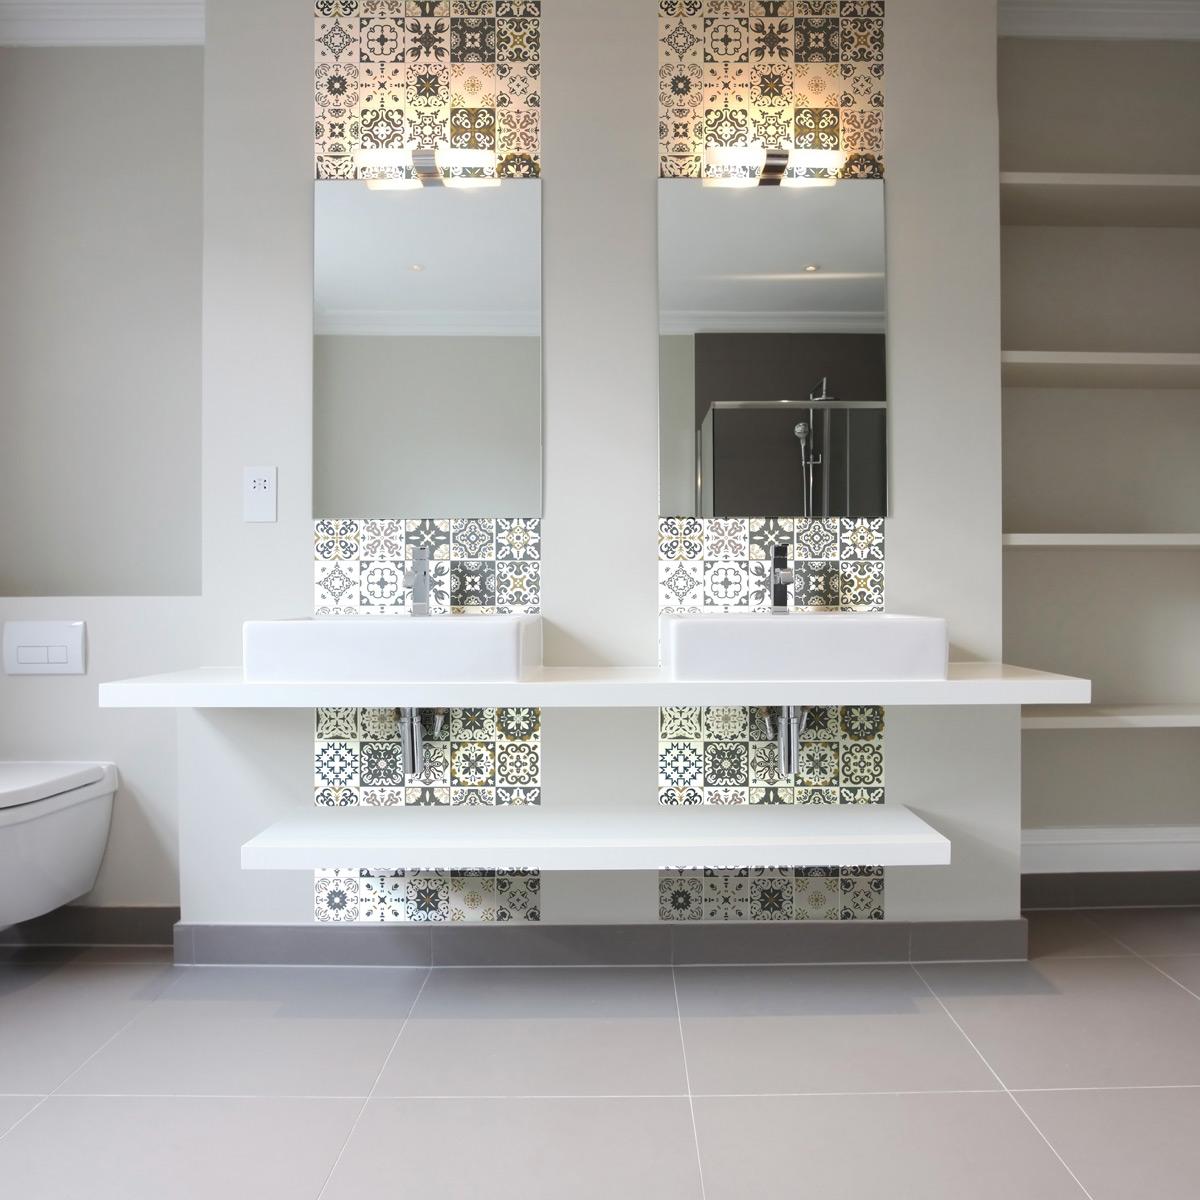 30 stickers carreaux de ciment antalya cuisine carrelages ambiance sticker. Black Bedroom Furniture Sets. Home Design Ideas